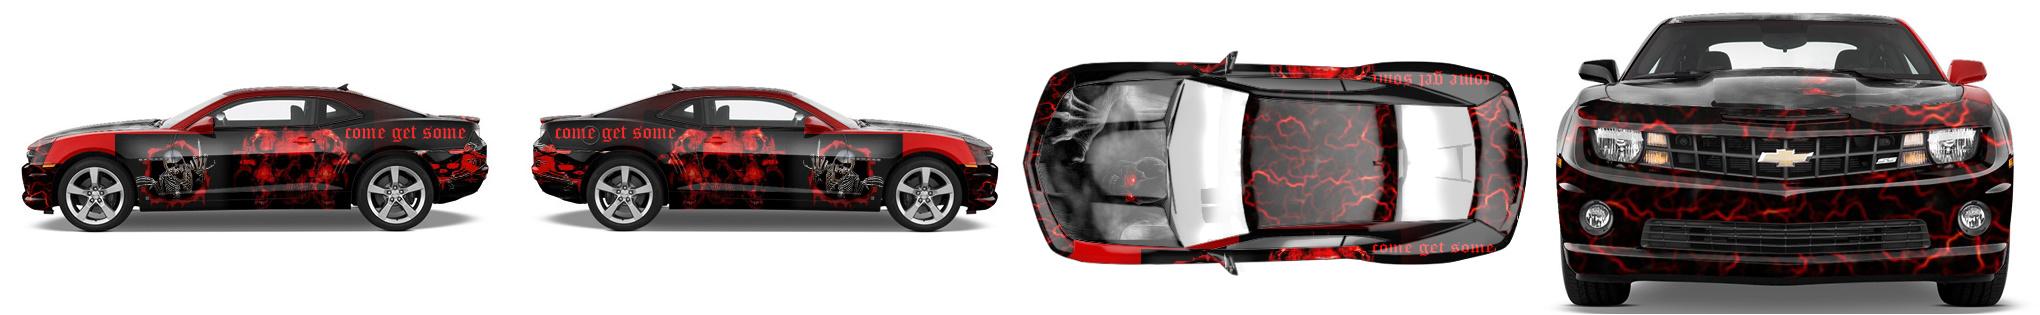 Muscle Car Wrap #1004